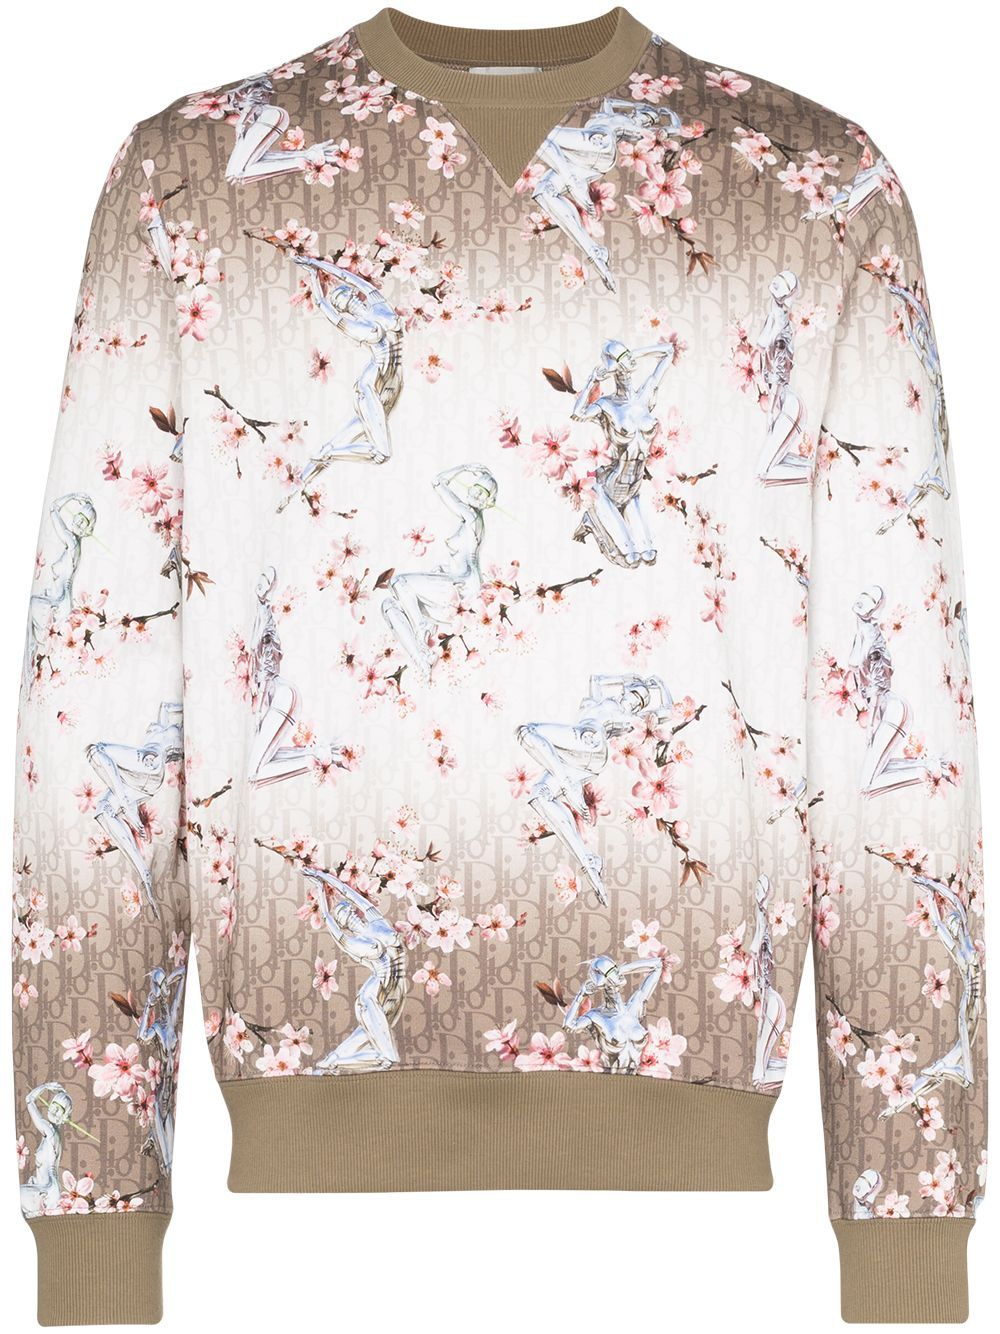 Dior Homme X Hajime Sorayama Robot Blossom Print Sweatshirt Neutrals Designer Sweatshirts Printed Sweatshirts Sweatshirts [ 1334 x 1000 Pixel ]